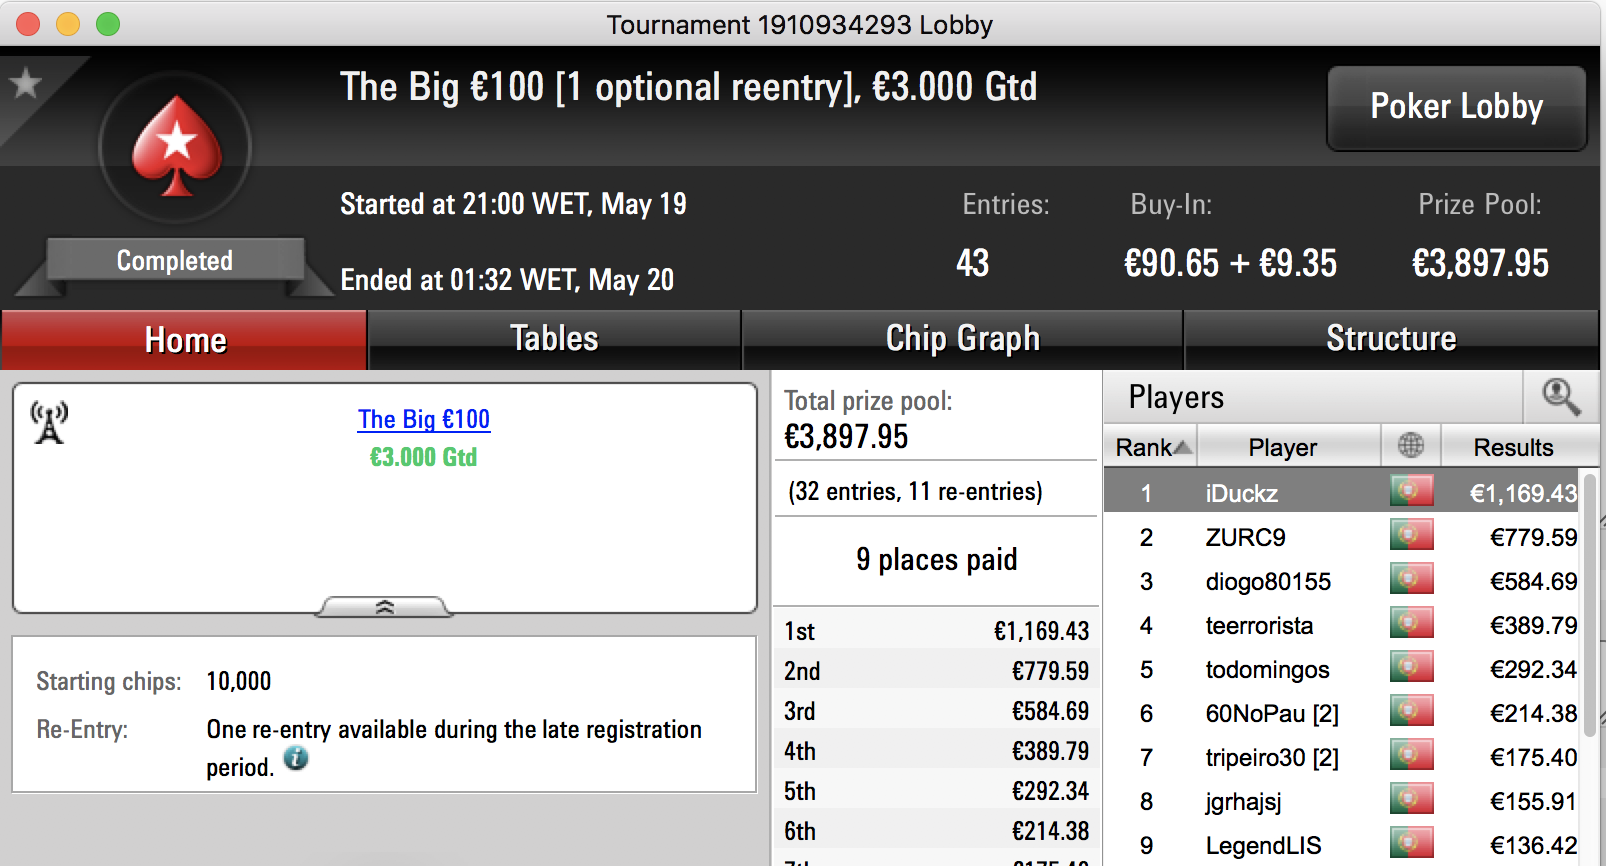 iDuckz Vence The Big €100, Tr8ght o The Hot BigStack Turbo €50 & Mais 101